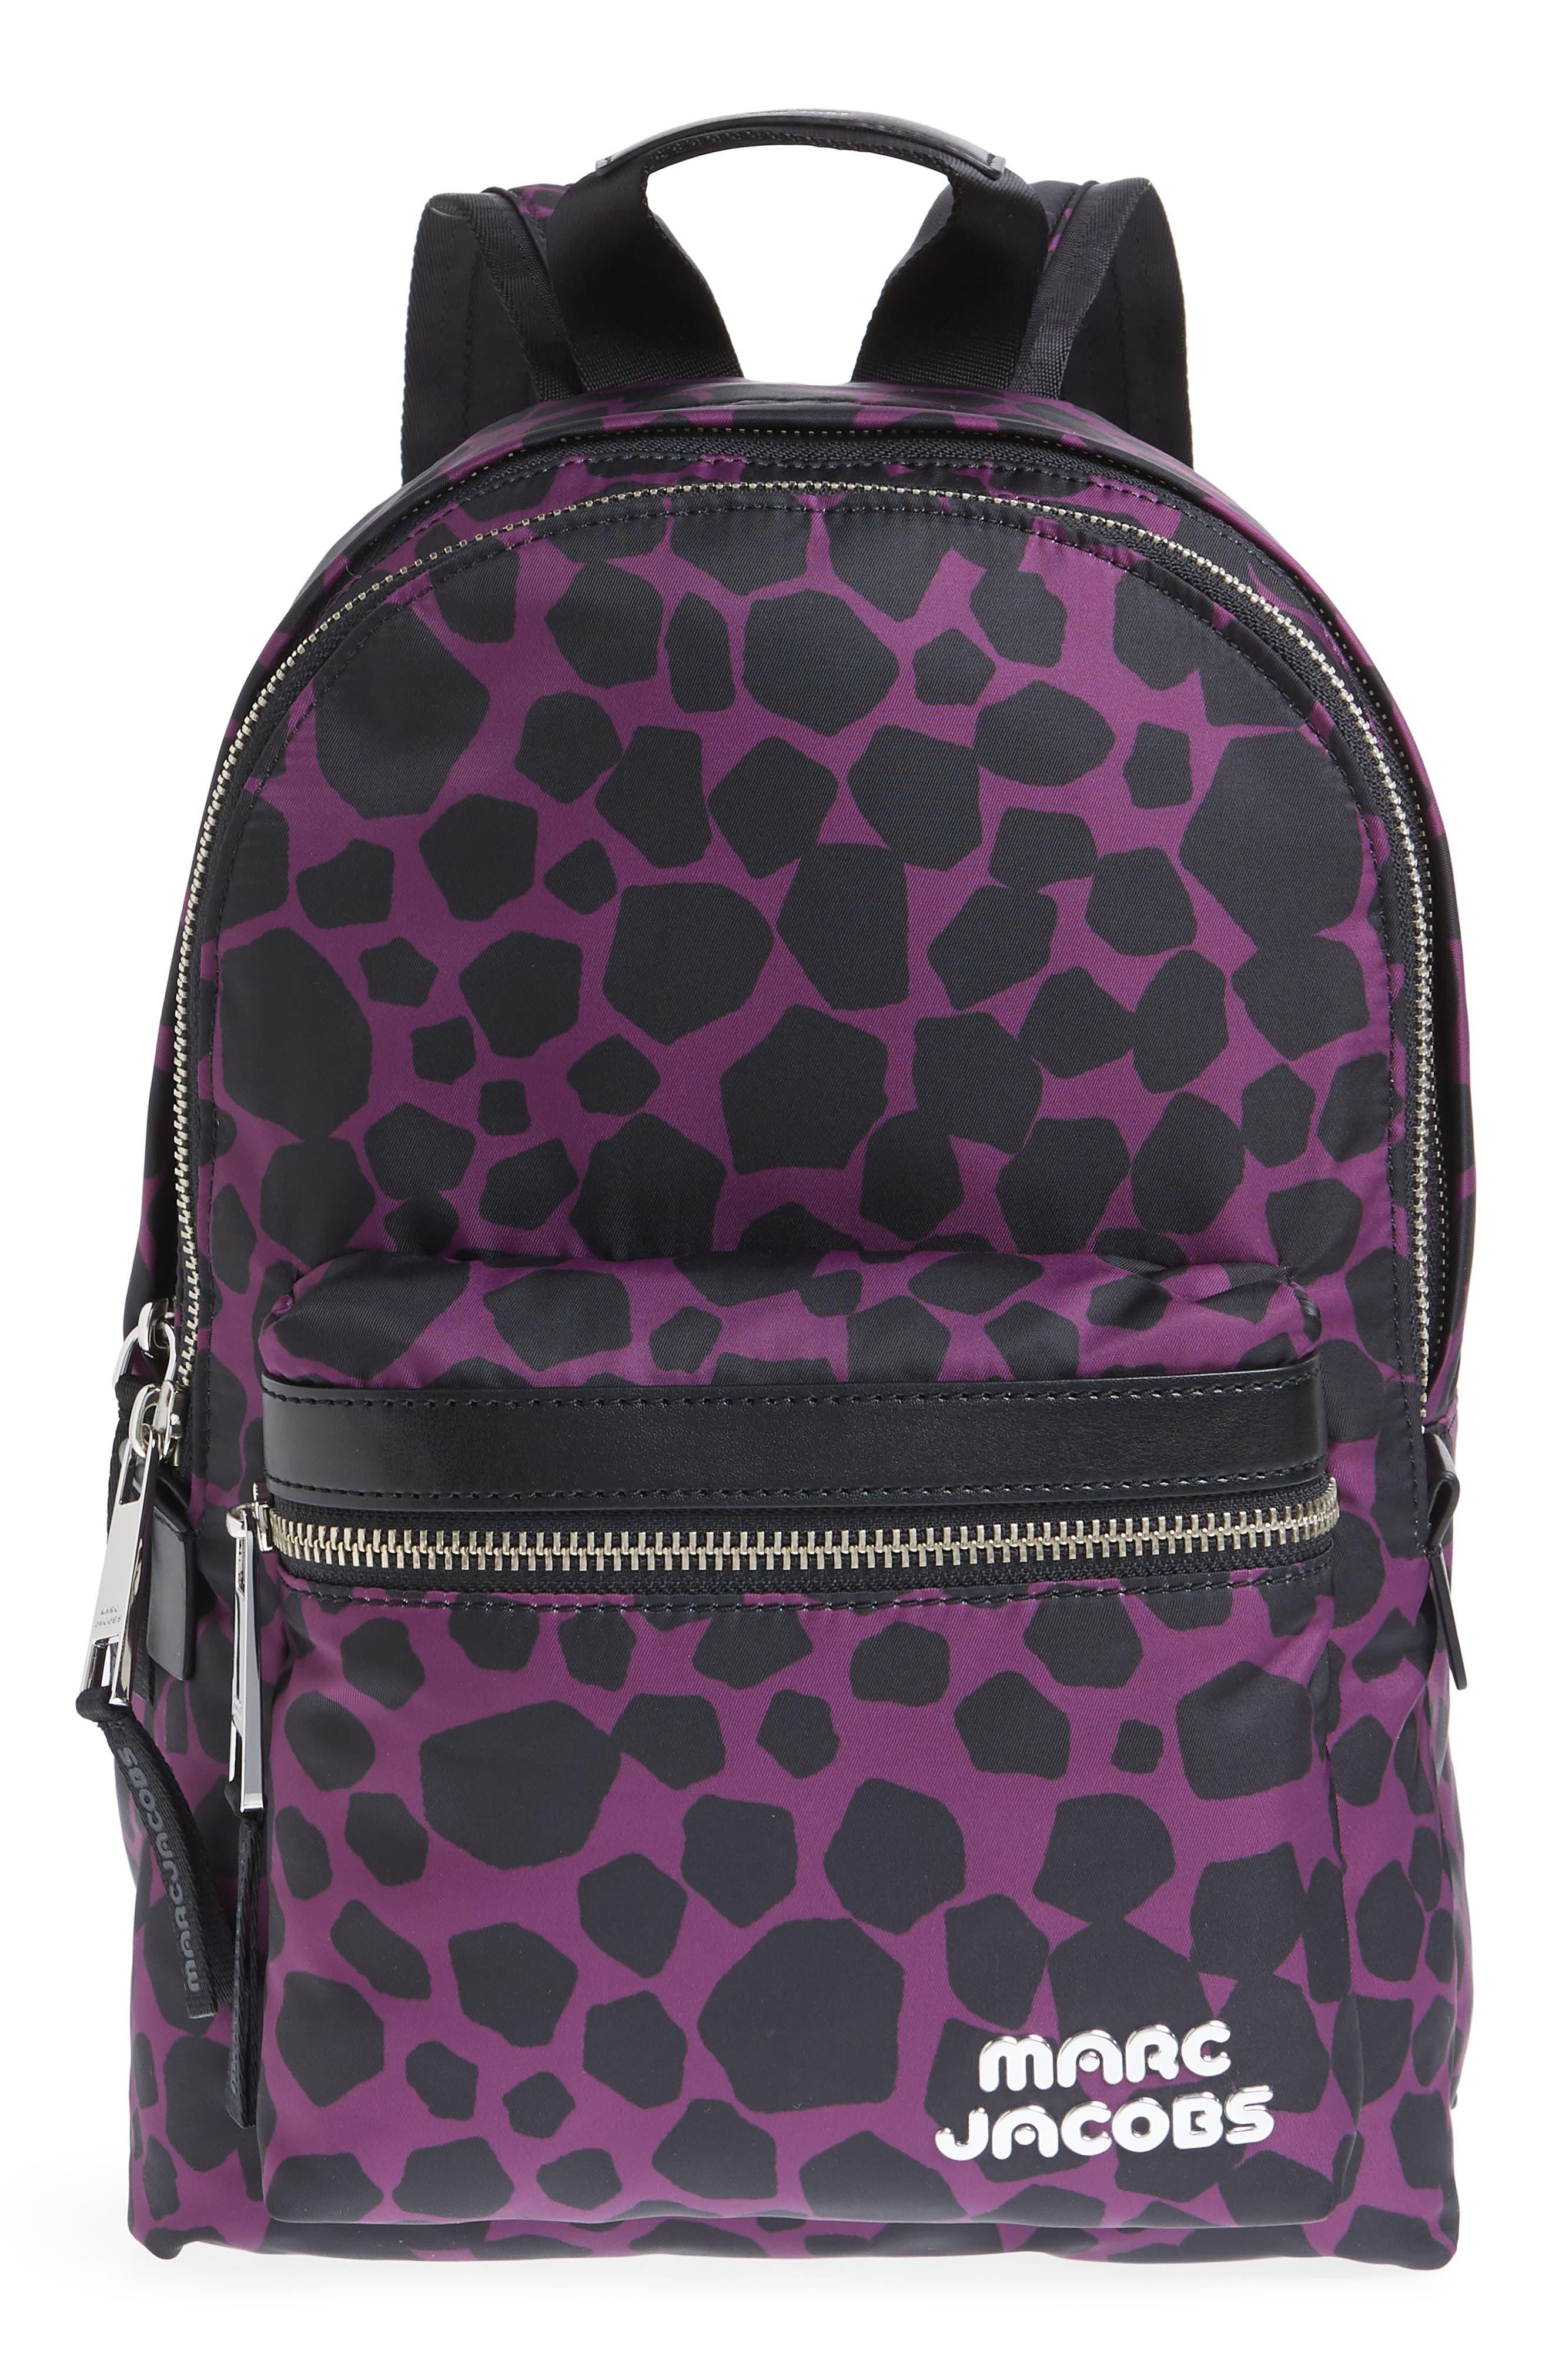 Medium Trek Pack Pebbles Backpack,                         Main,                         color, BERRY MULTI